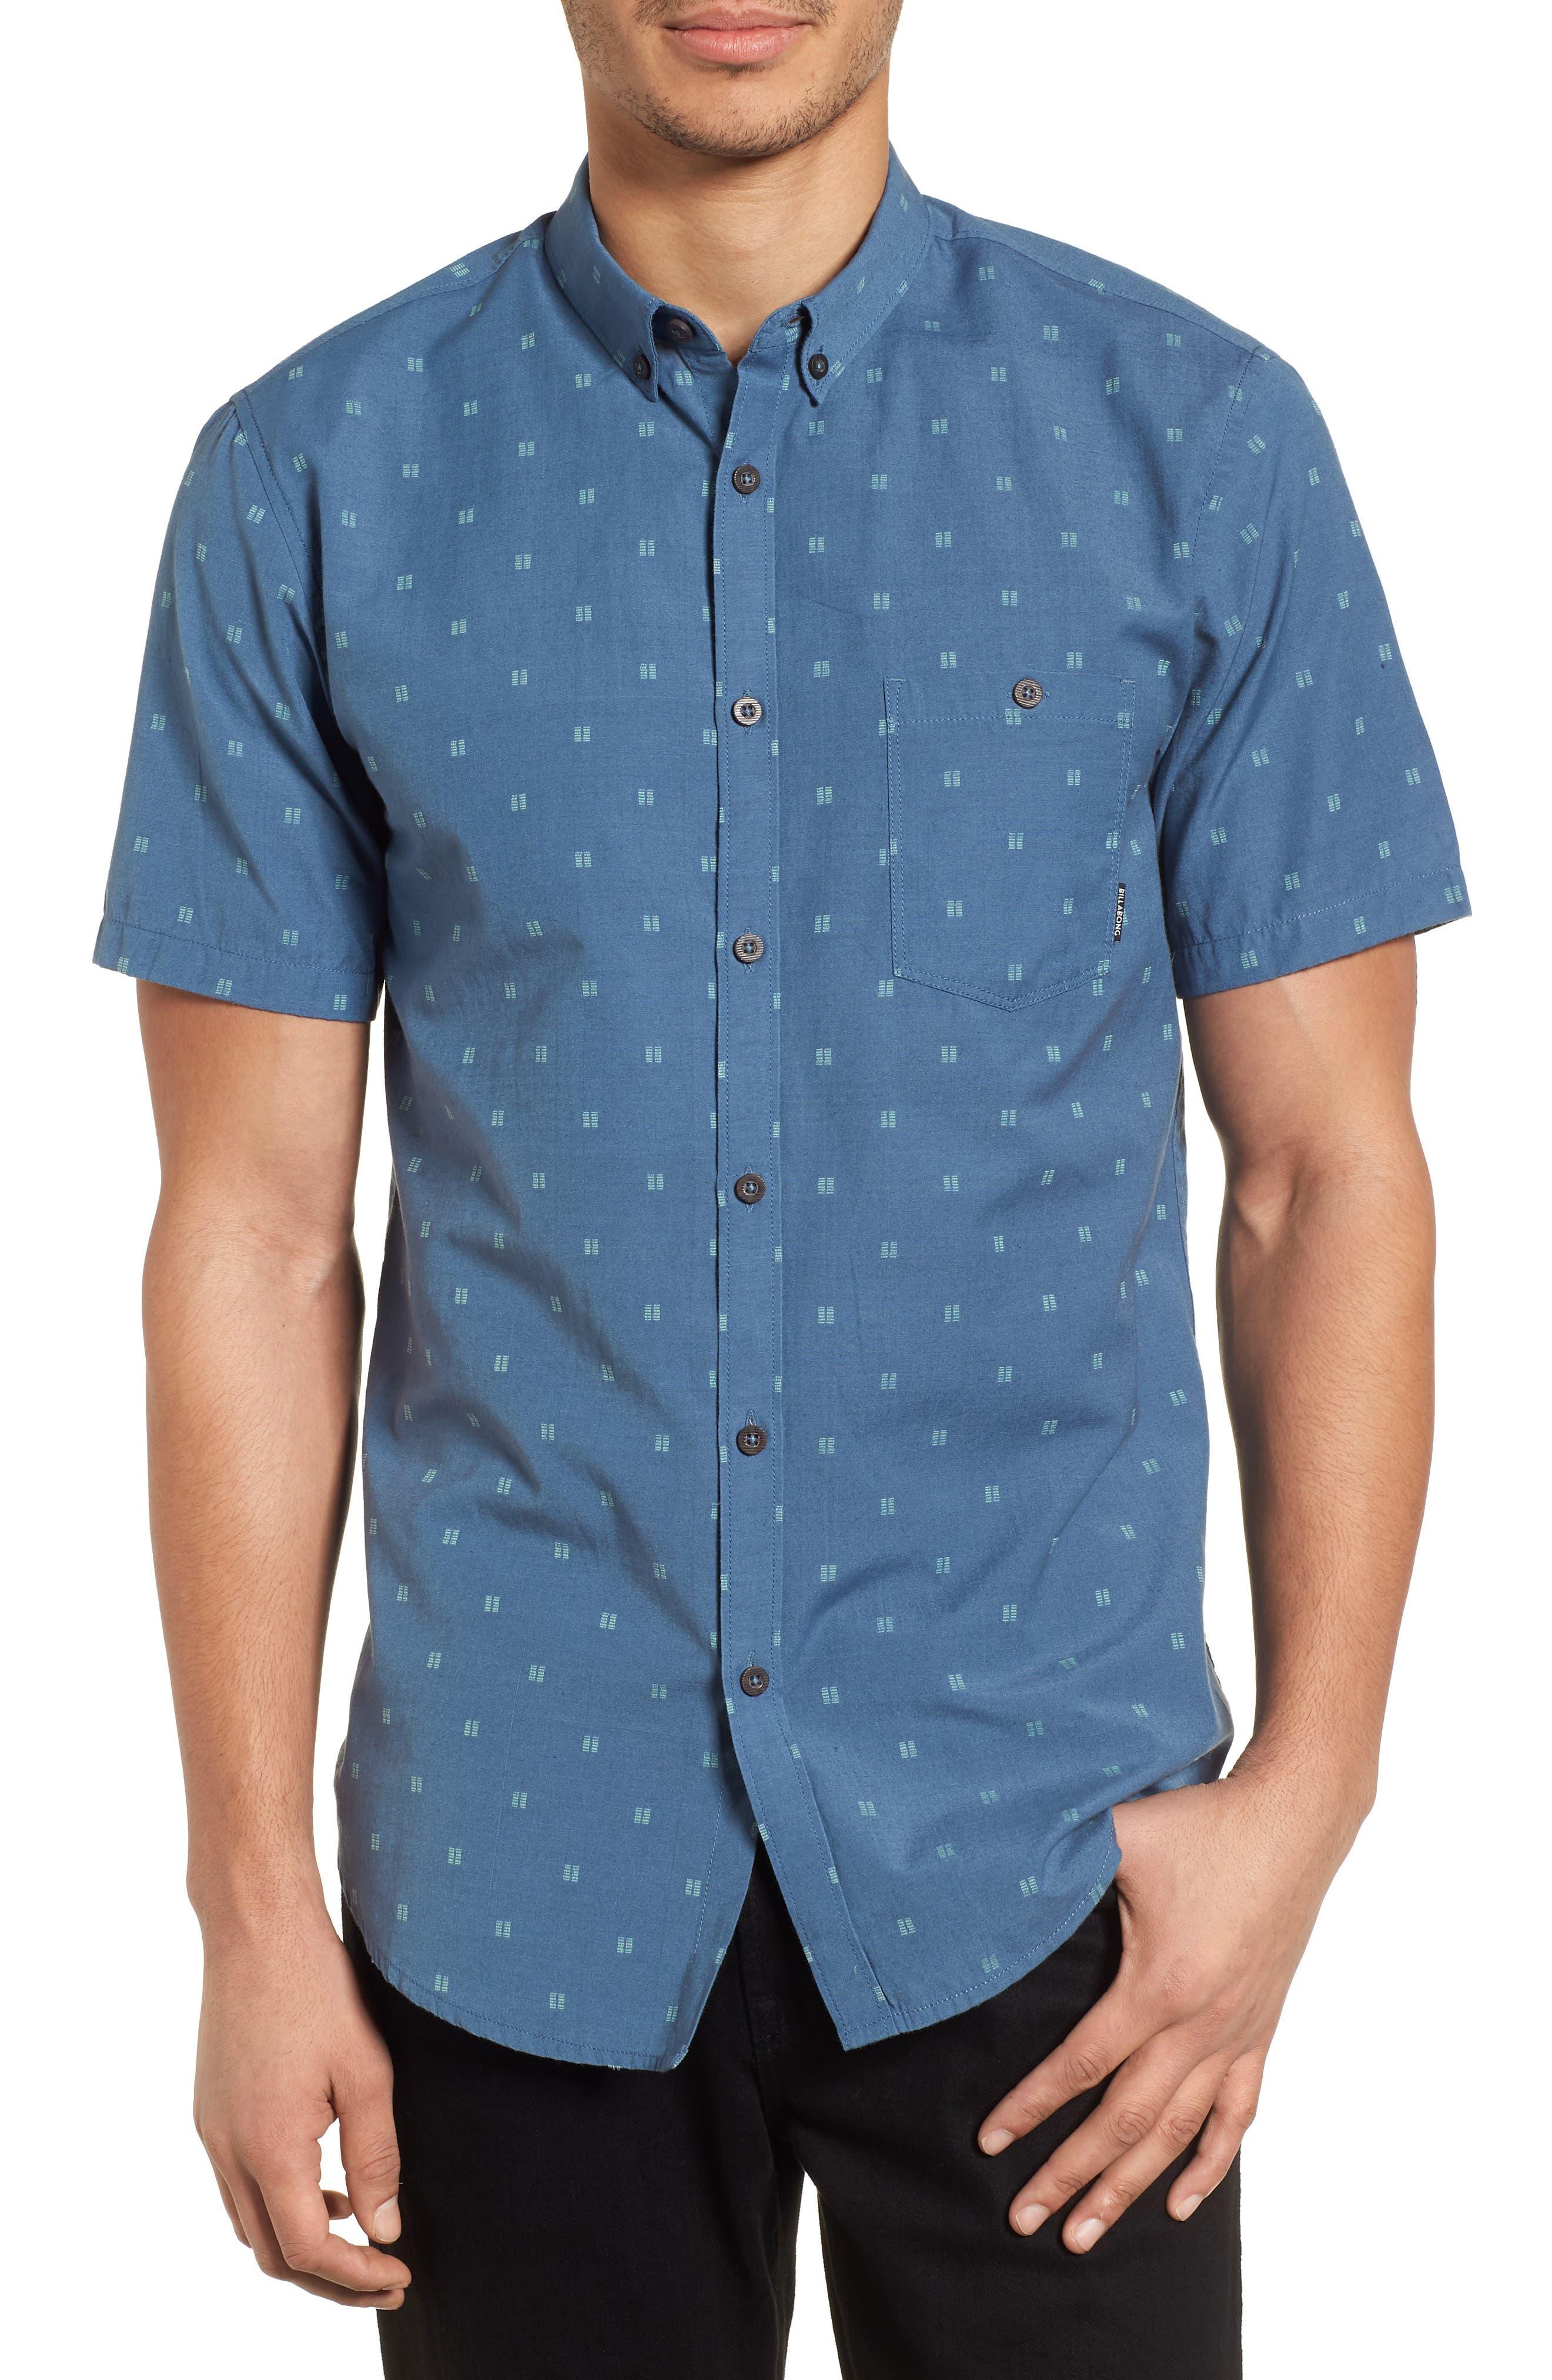 All Day Jacquard Shirt,                             Main thumbnail 1, color,                             Deep Blue